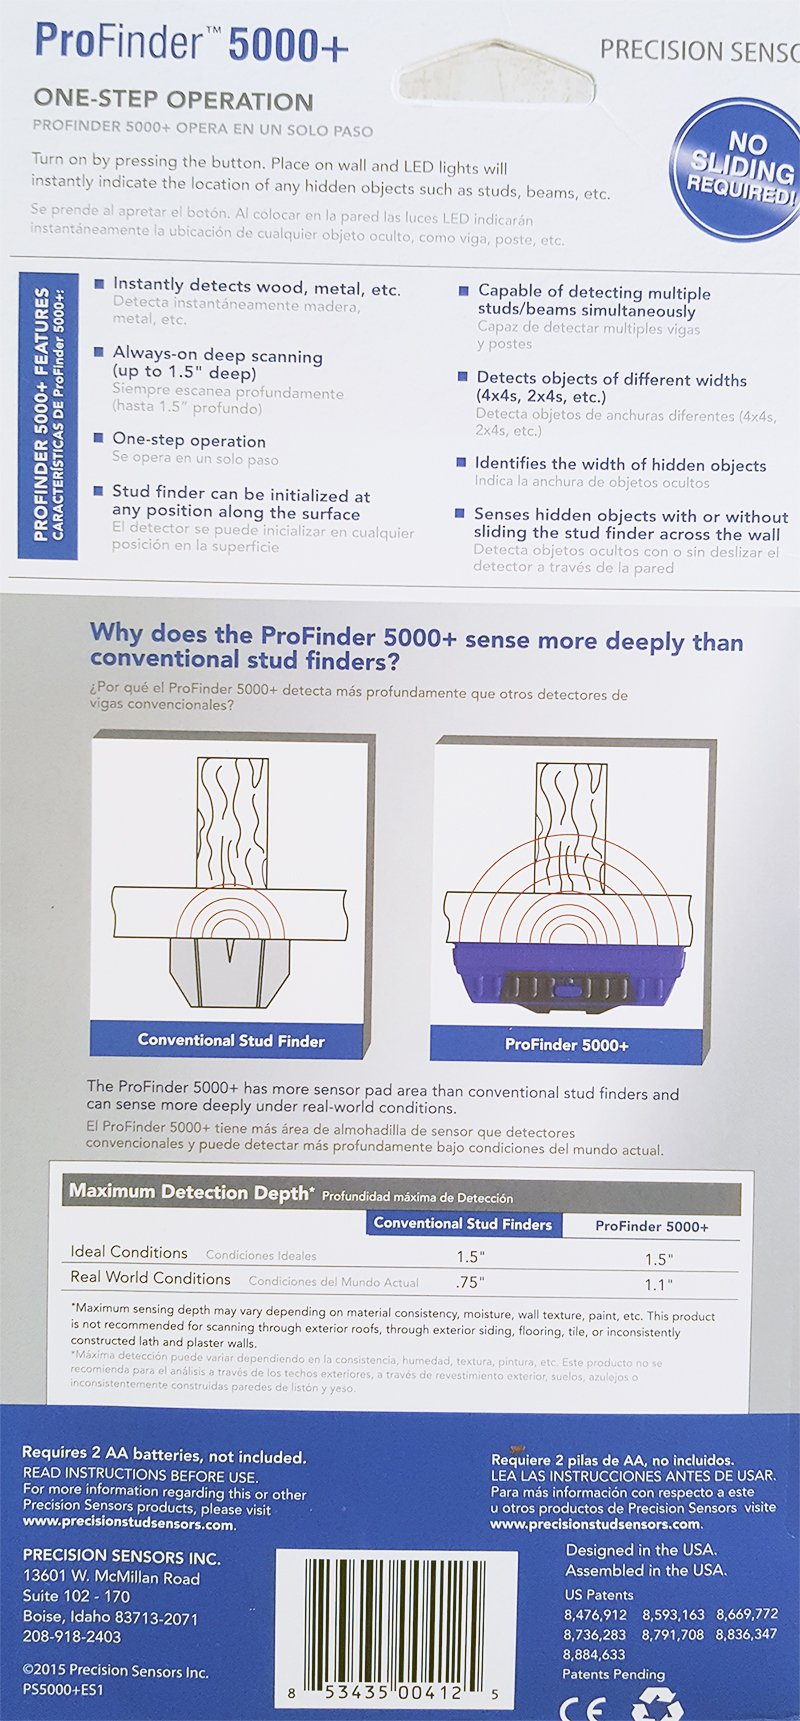 ProFinder 5000+ Professional Stud Finder - Newest PLUS Model Deep Scanning Precision Sensor Locator w Built-In Bubble Level and Ruler